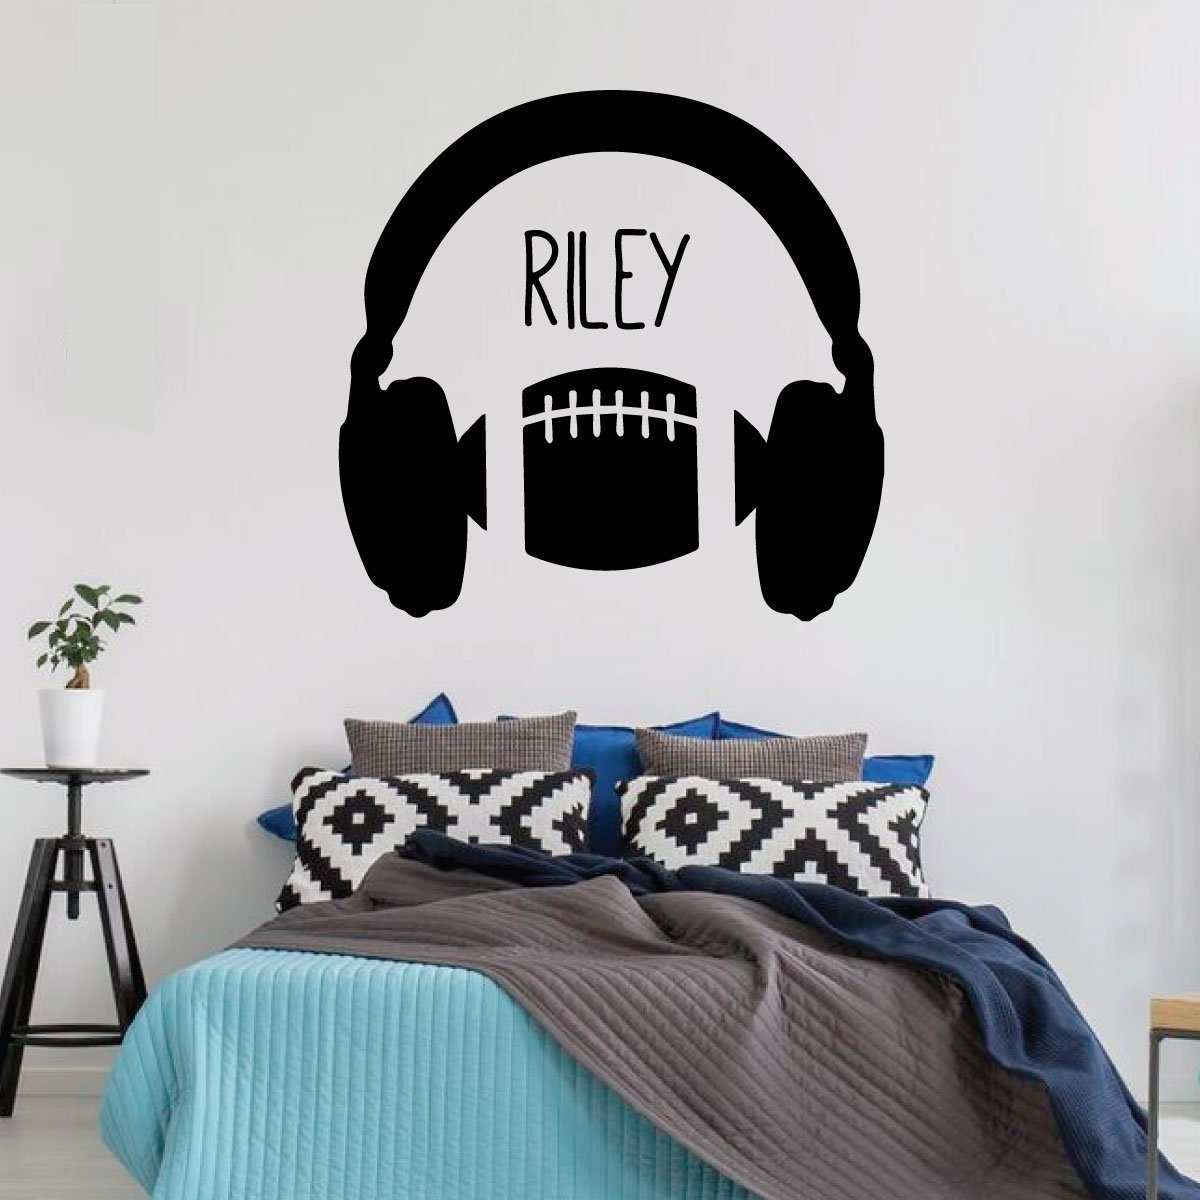 Football Wall Decal - Headphones - Vinyl Art Sticker for Boy's Bedroom Decor, Playroom or Game Room Decoration